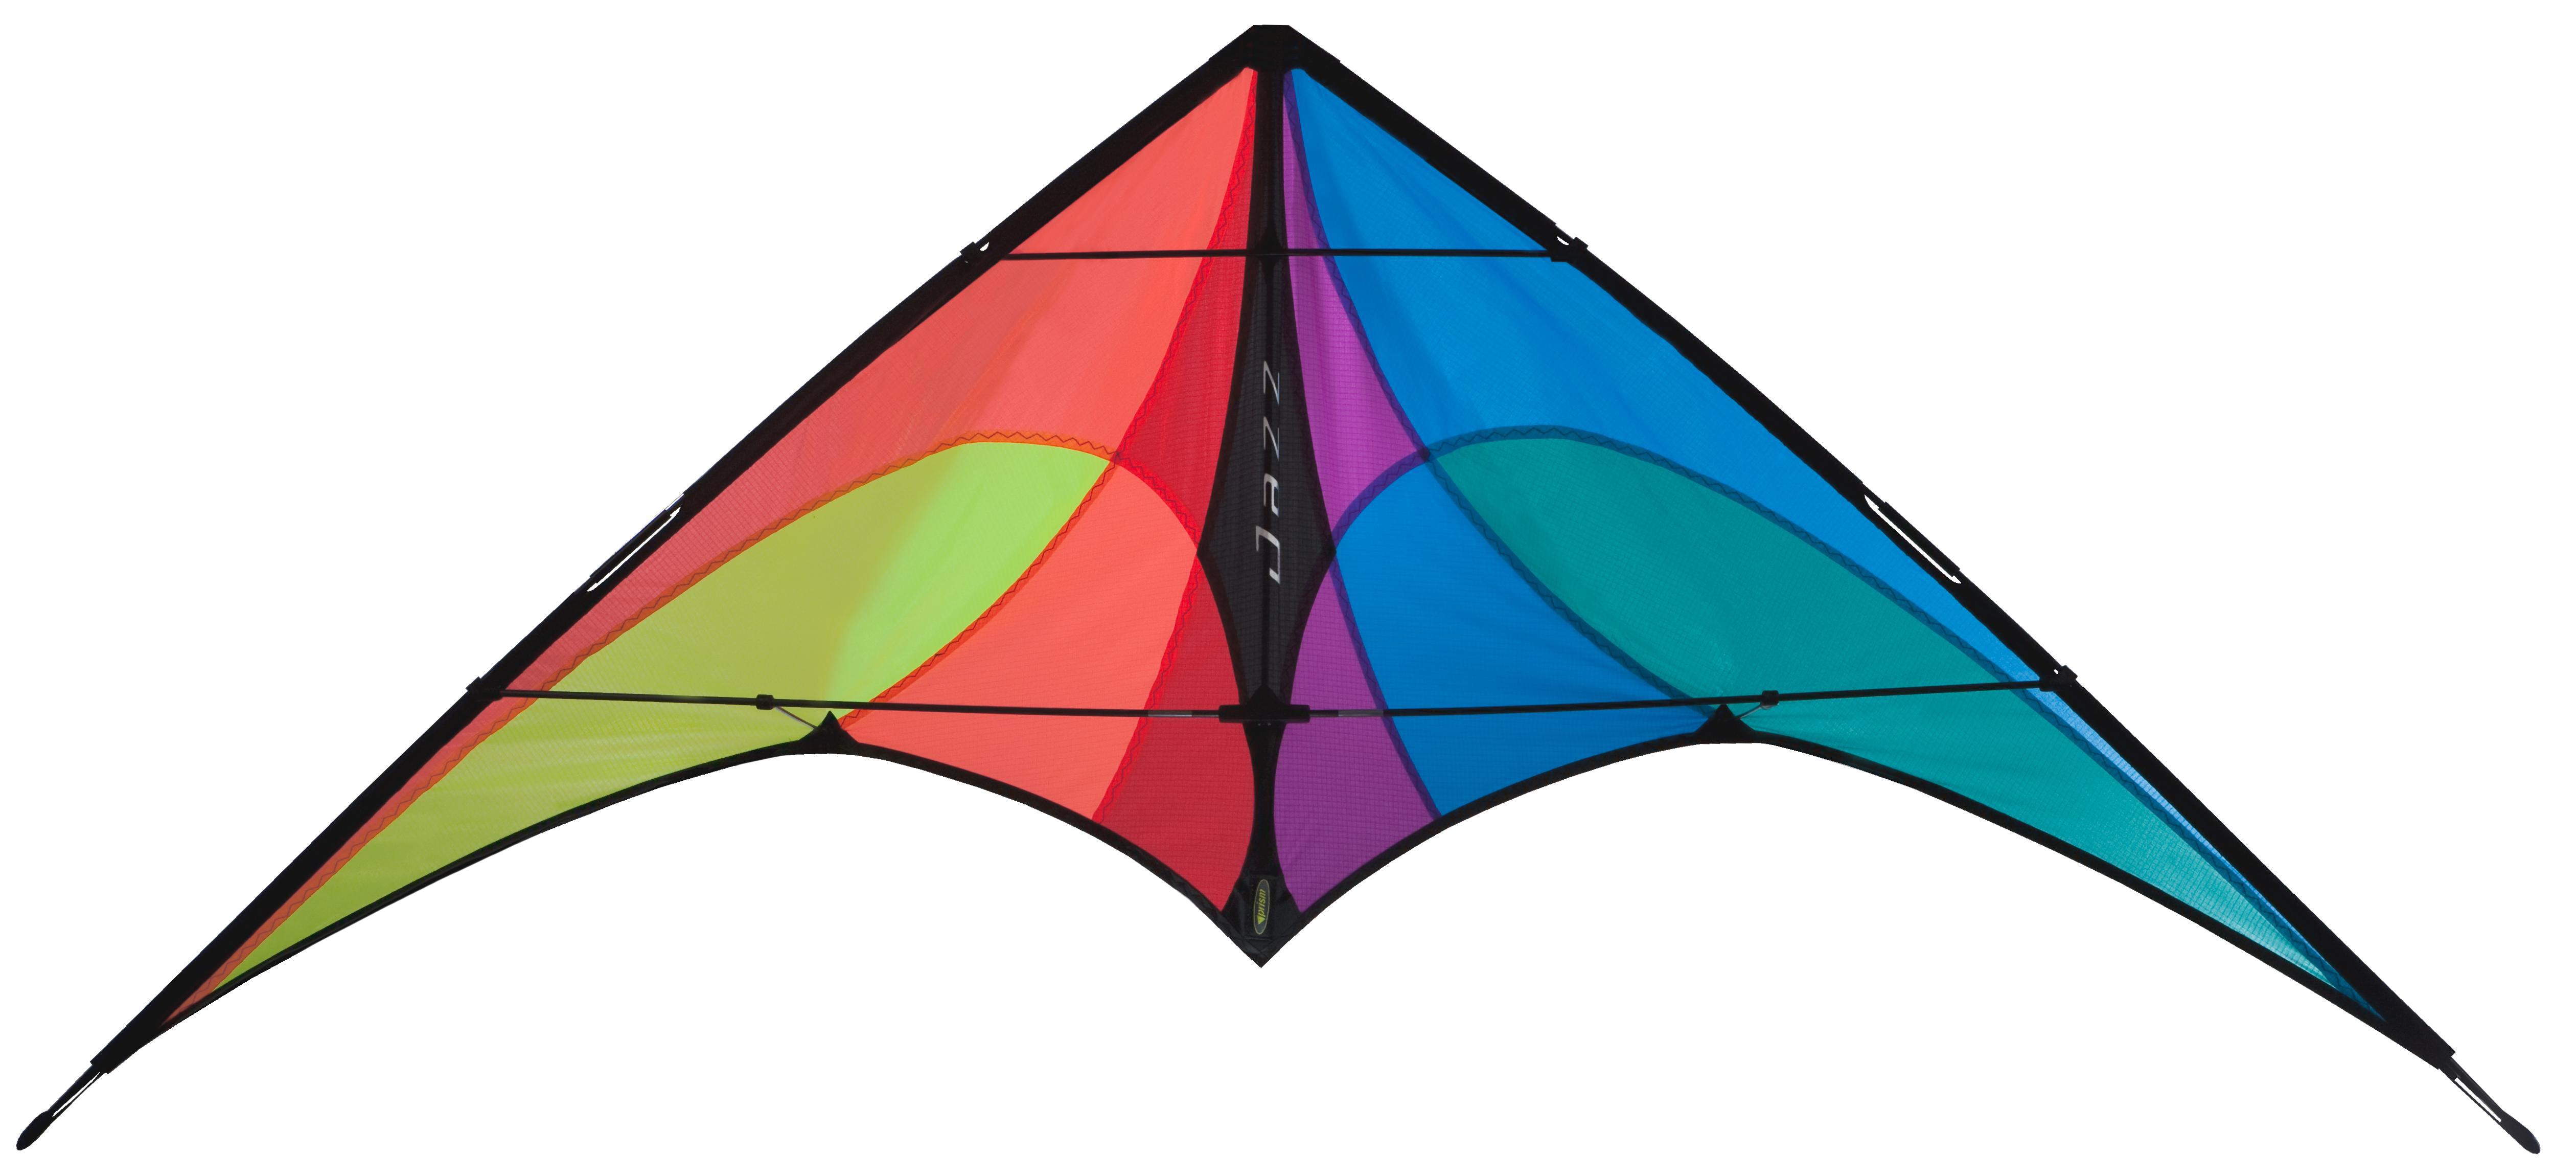 Clipart toys kite. Prism jazz stunt spectrum